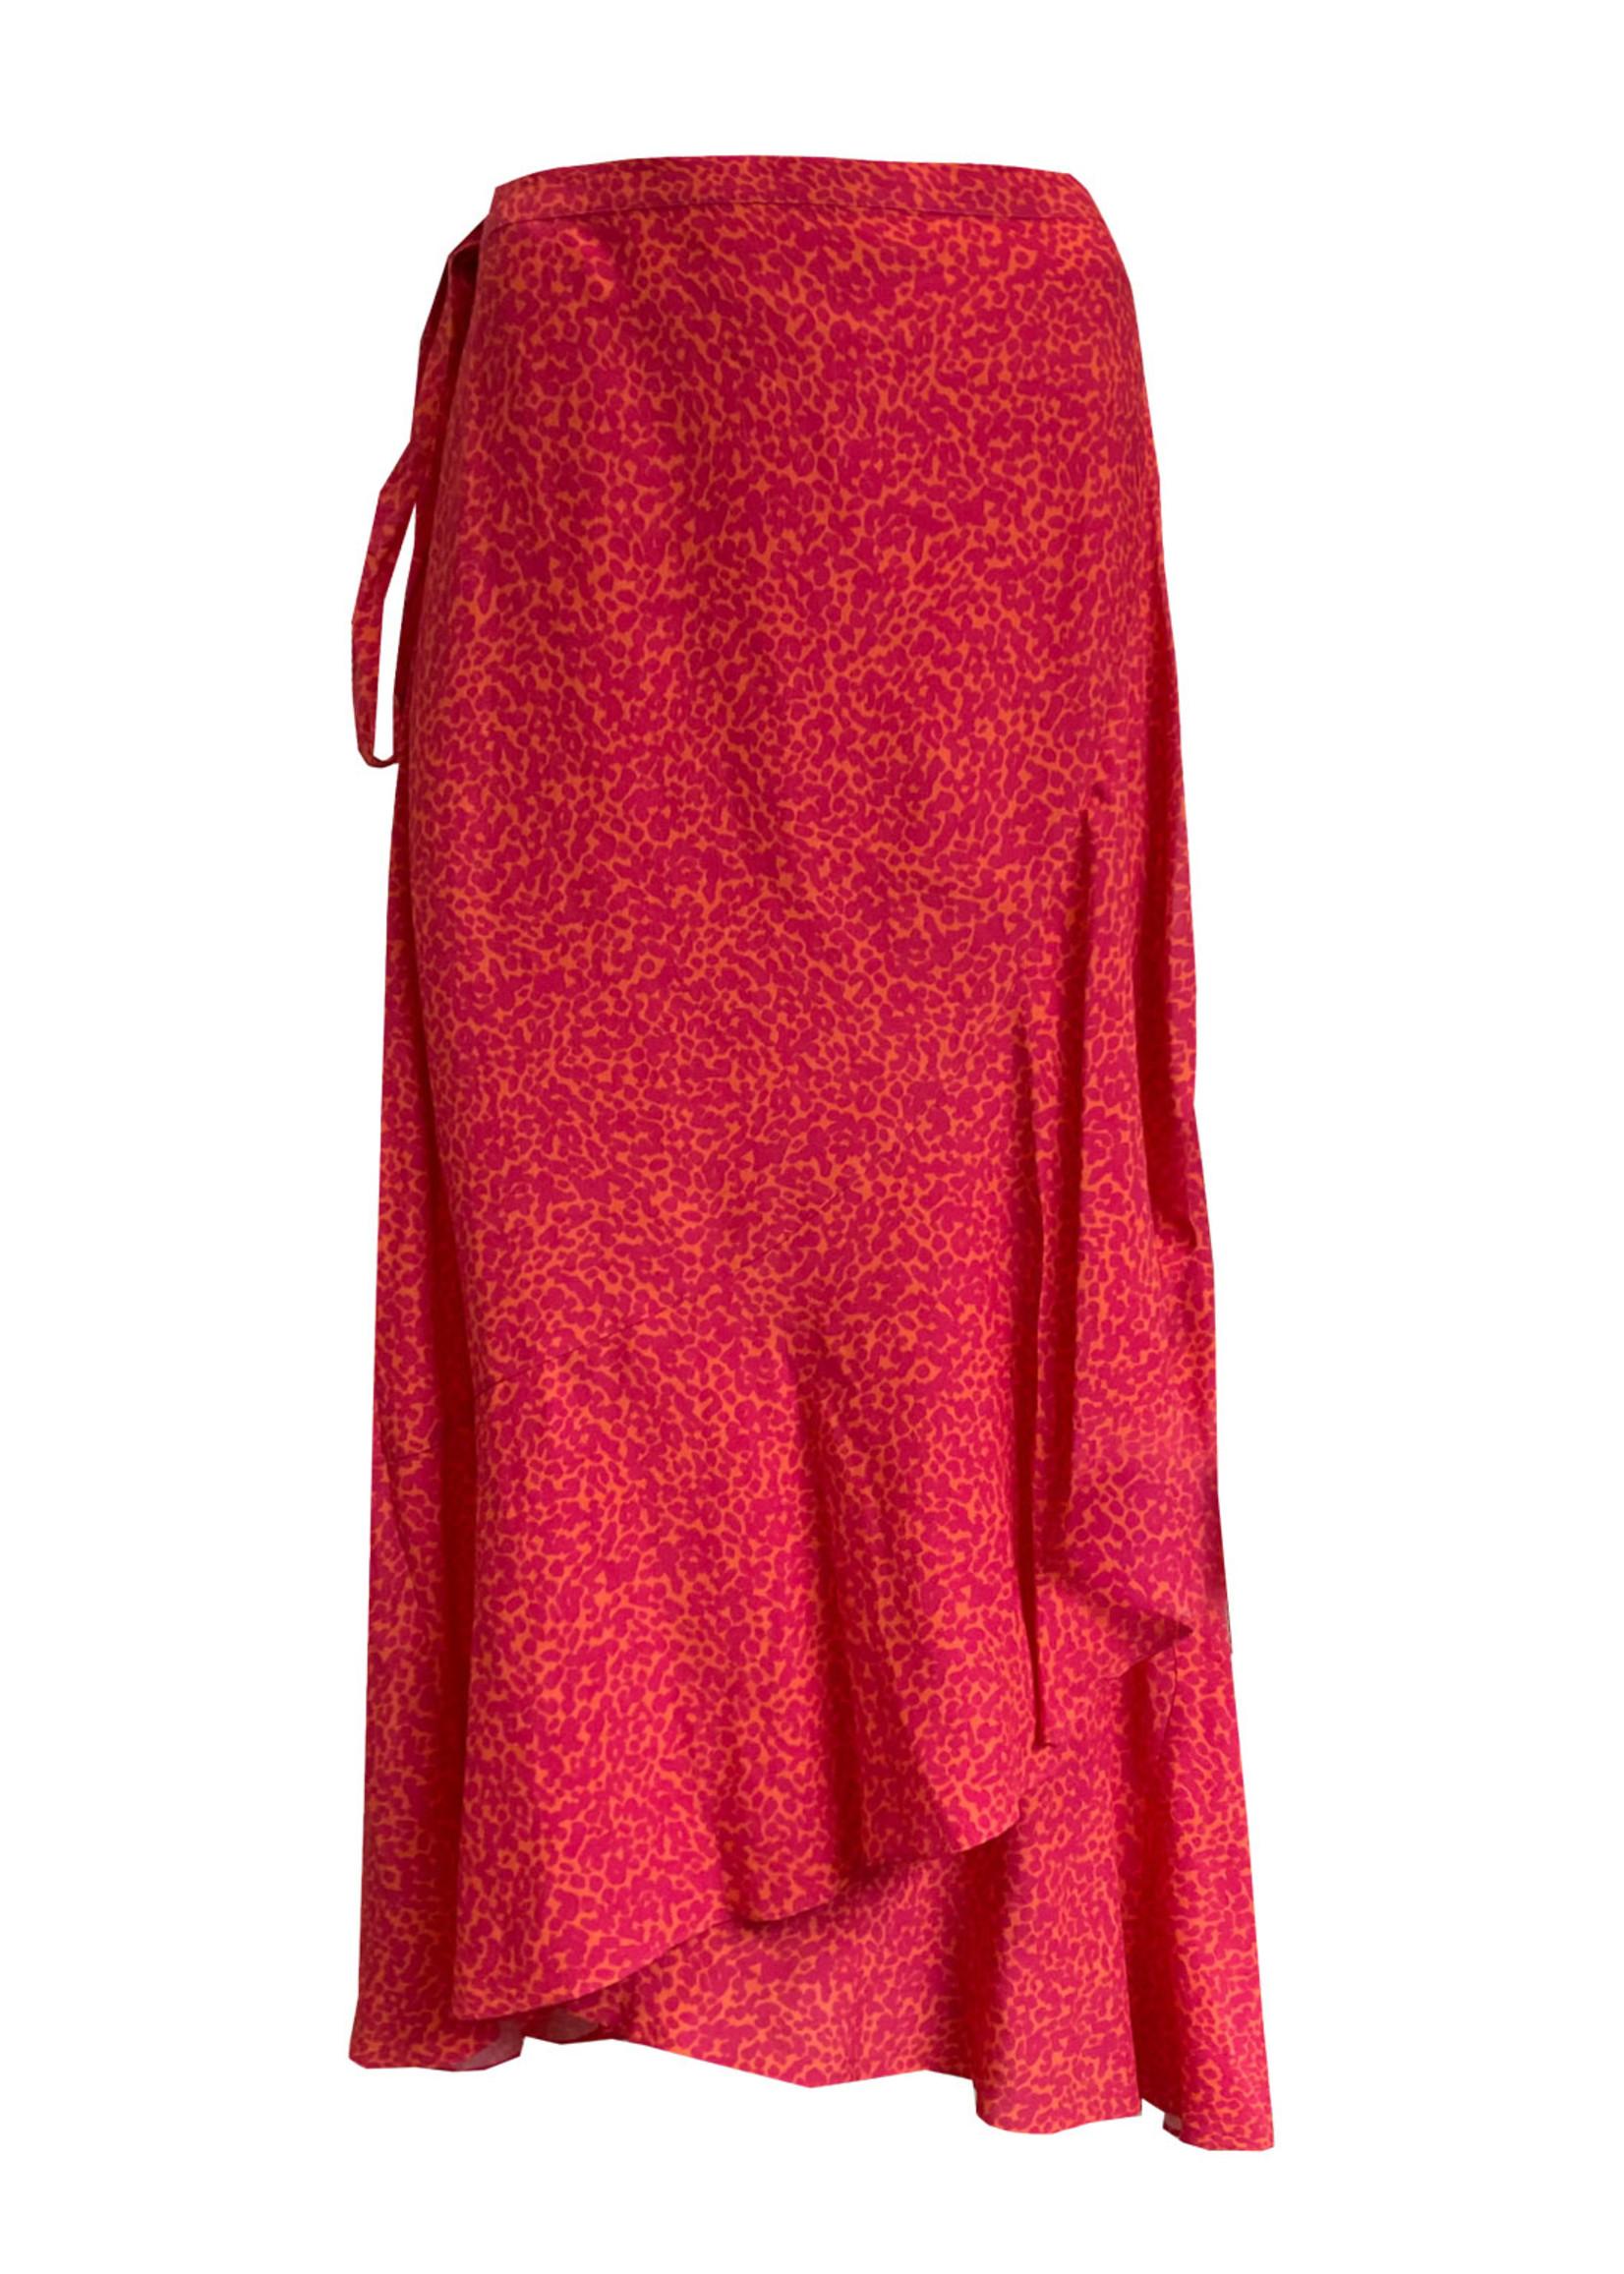 Elvira Collections Elvira Collections Yara Skirt